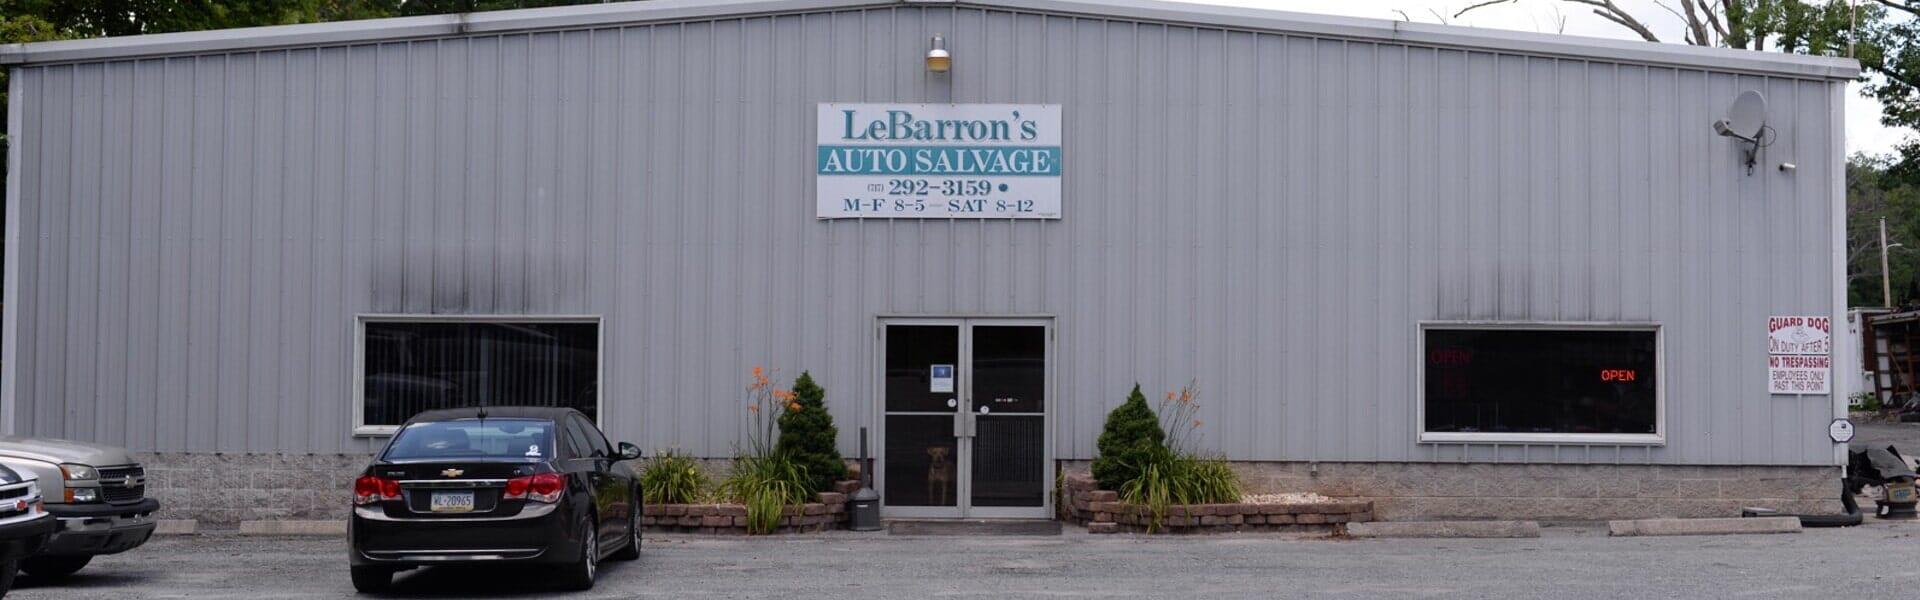 Carlisle Auto Salvage >> New and Used Auto Parts - Dover, Pennsylvania - Lebarron's Auto Salvage